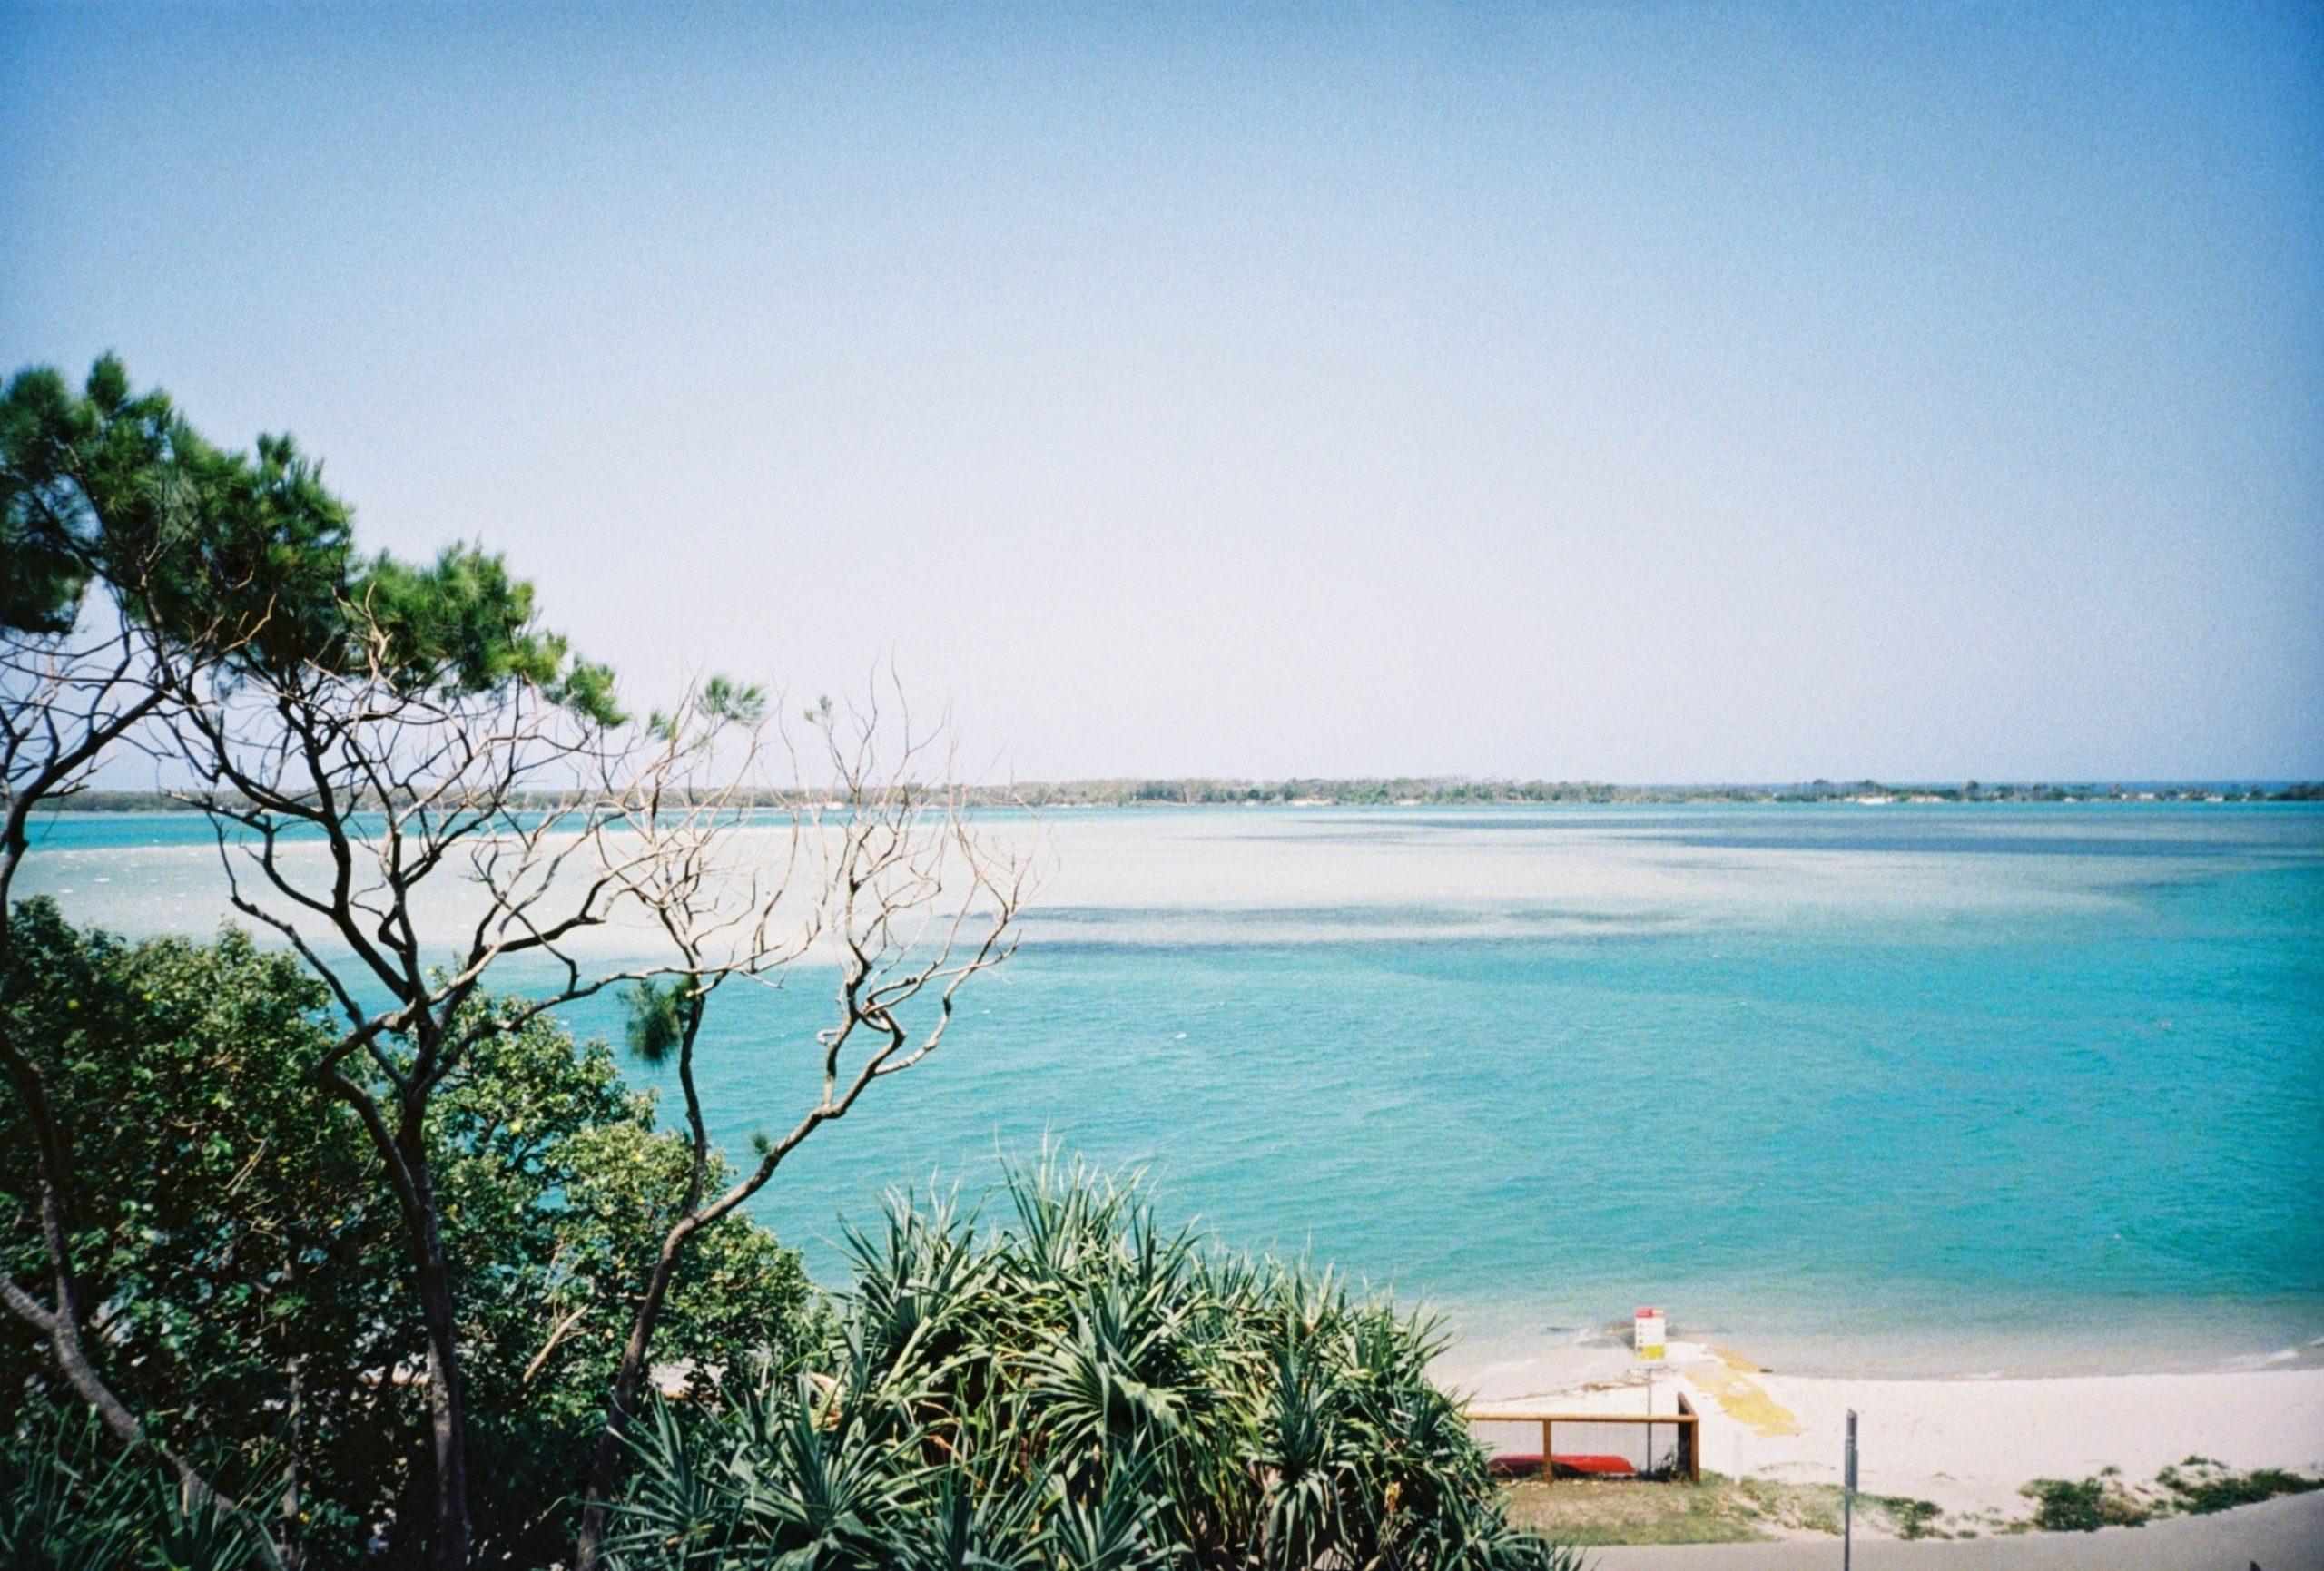 43 Fun Things to do in Caloundra Queensland